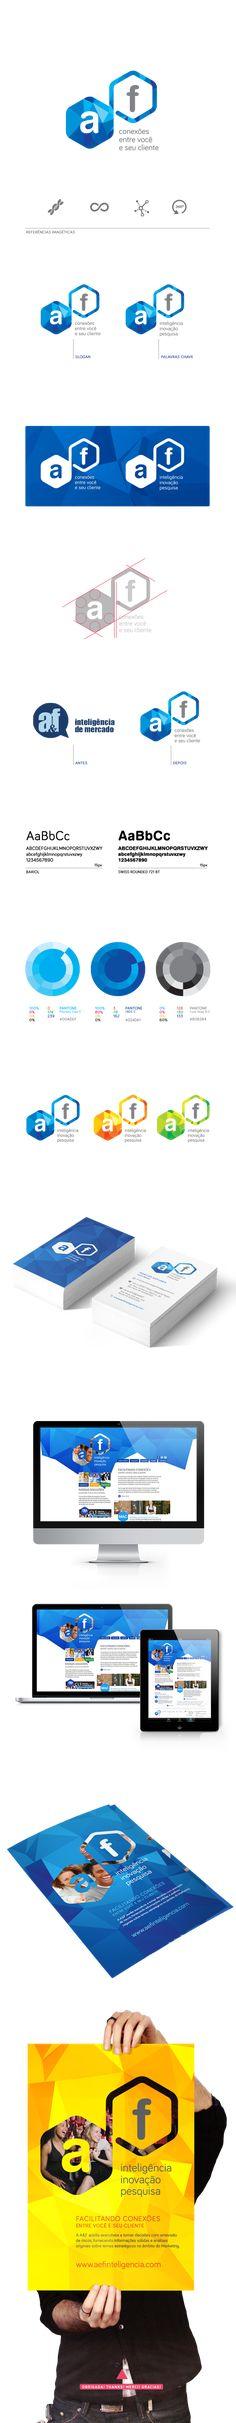 A&F Inteligência - Branding & Web on Behance